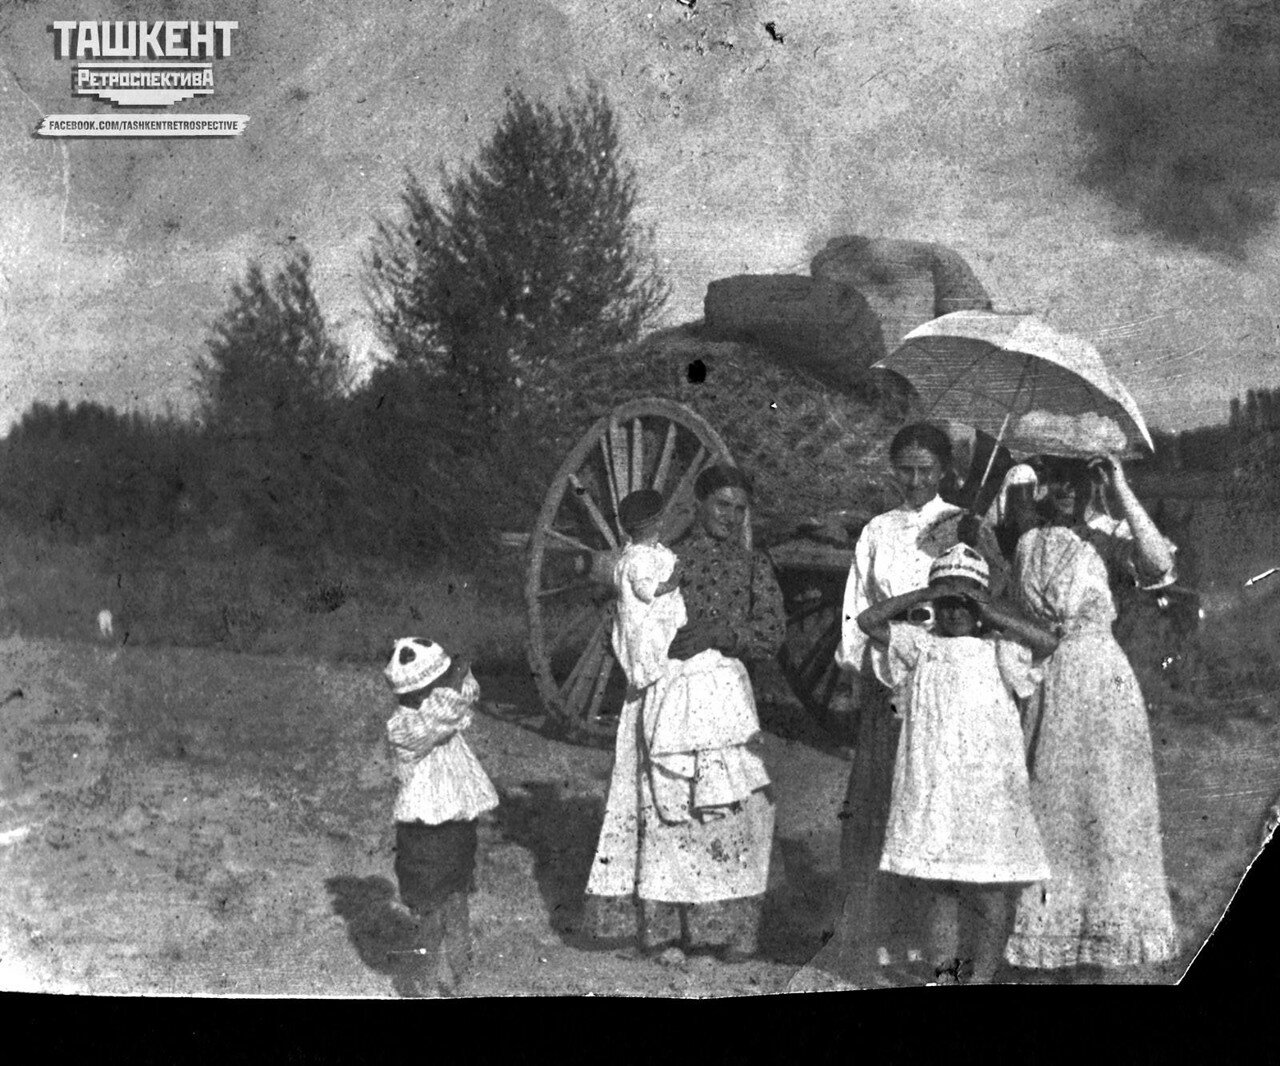 Окрестности Ташкента, 1909